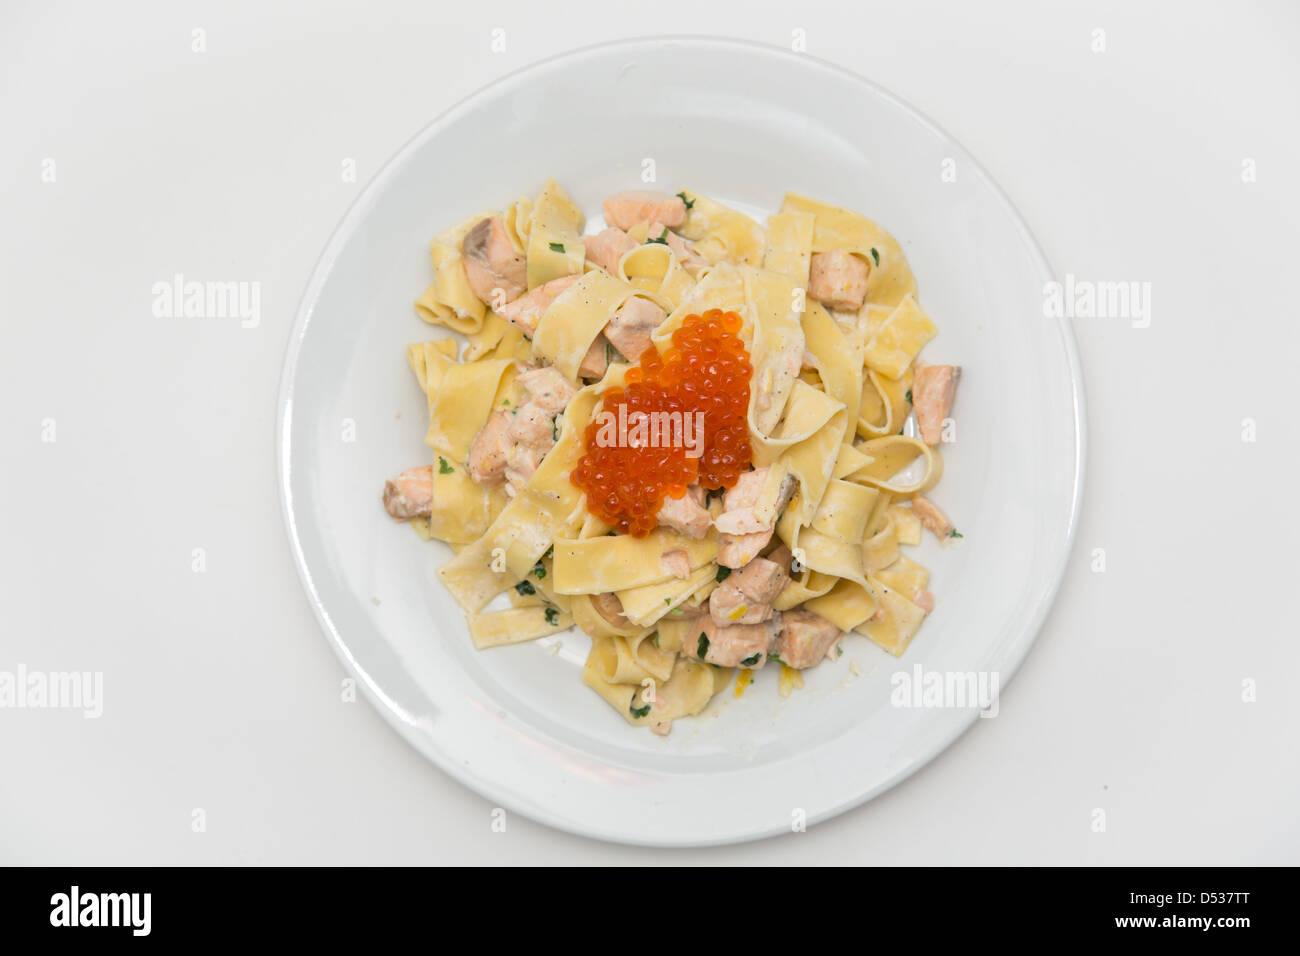 Pasta with caviar and salmon fish - Stock Image